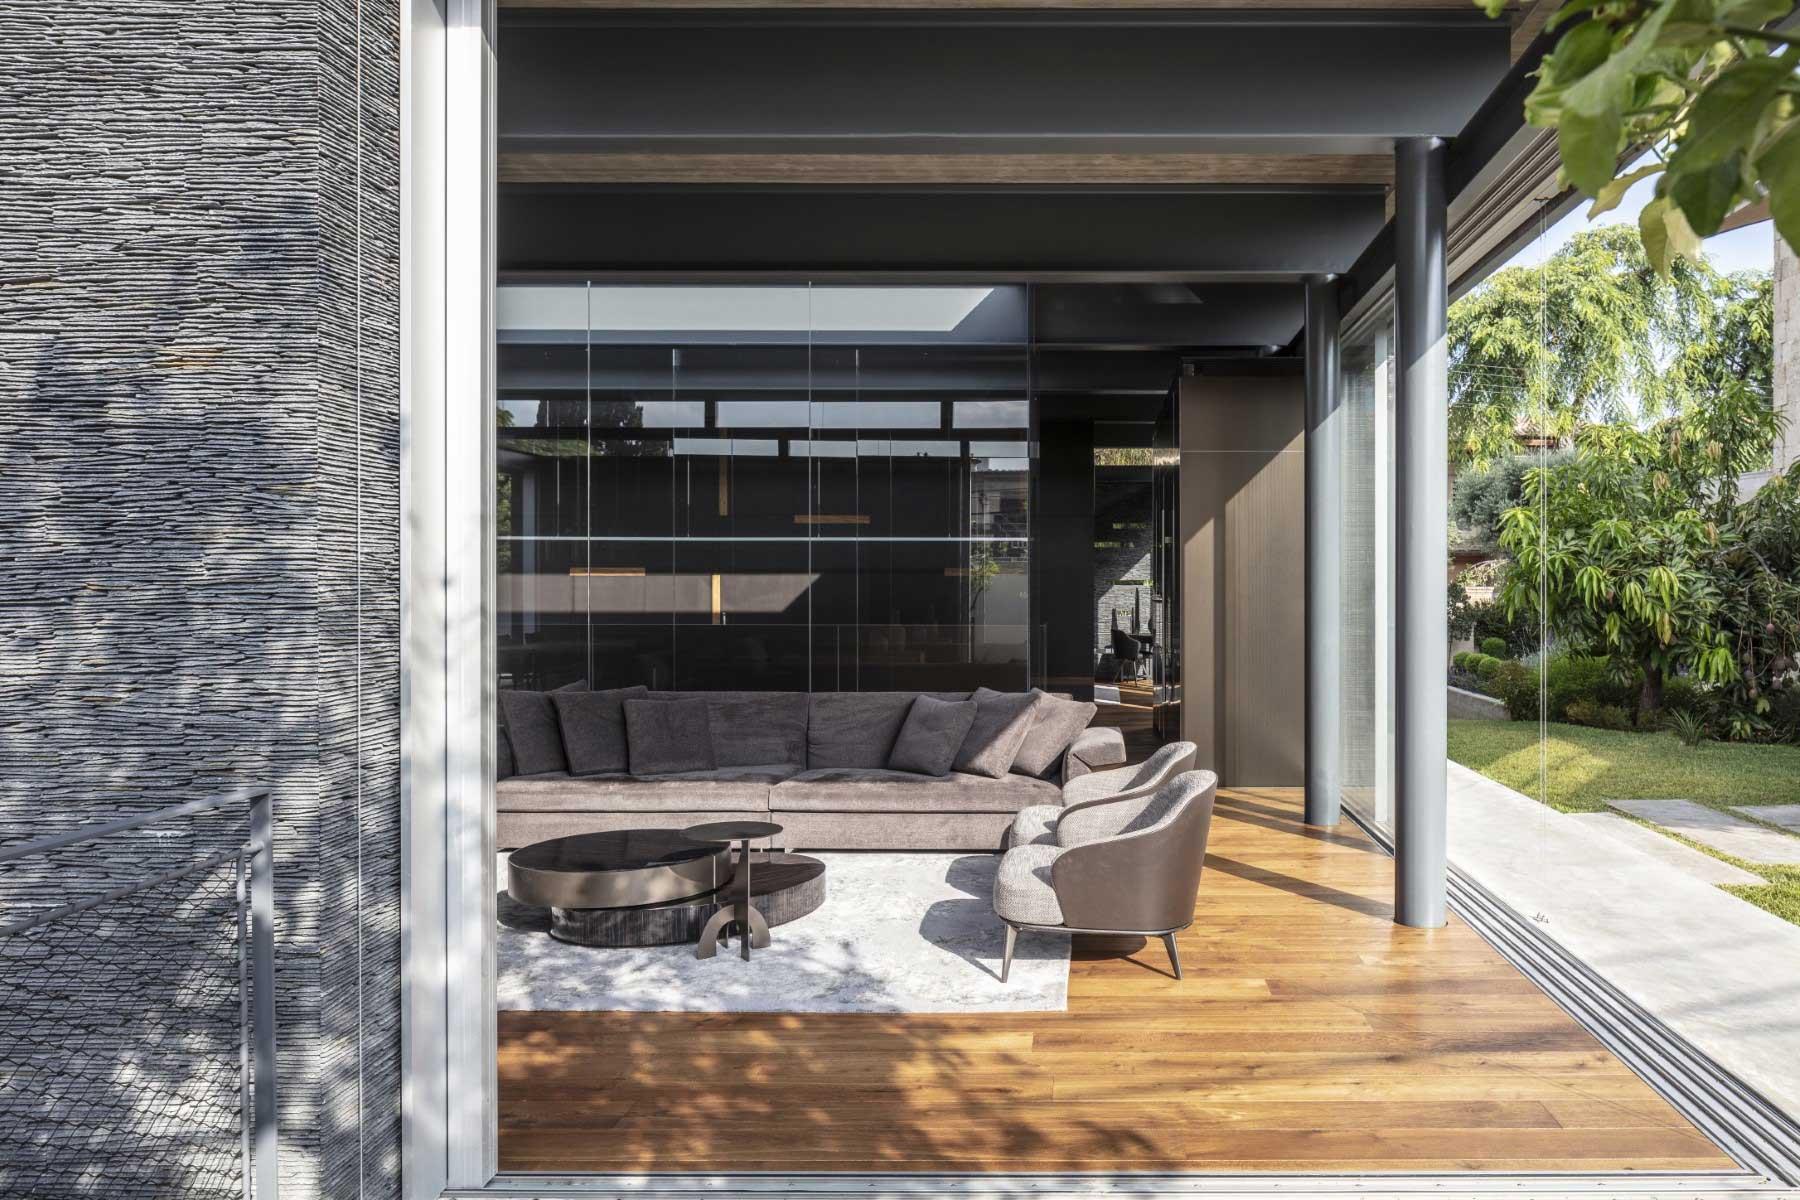 Pavilion House Pavilion-House-Pitsou-Kedem_03